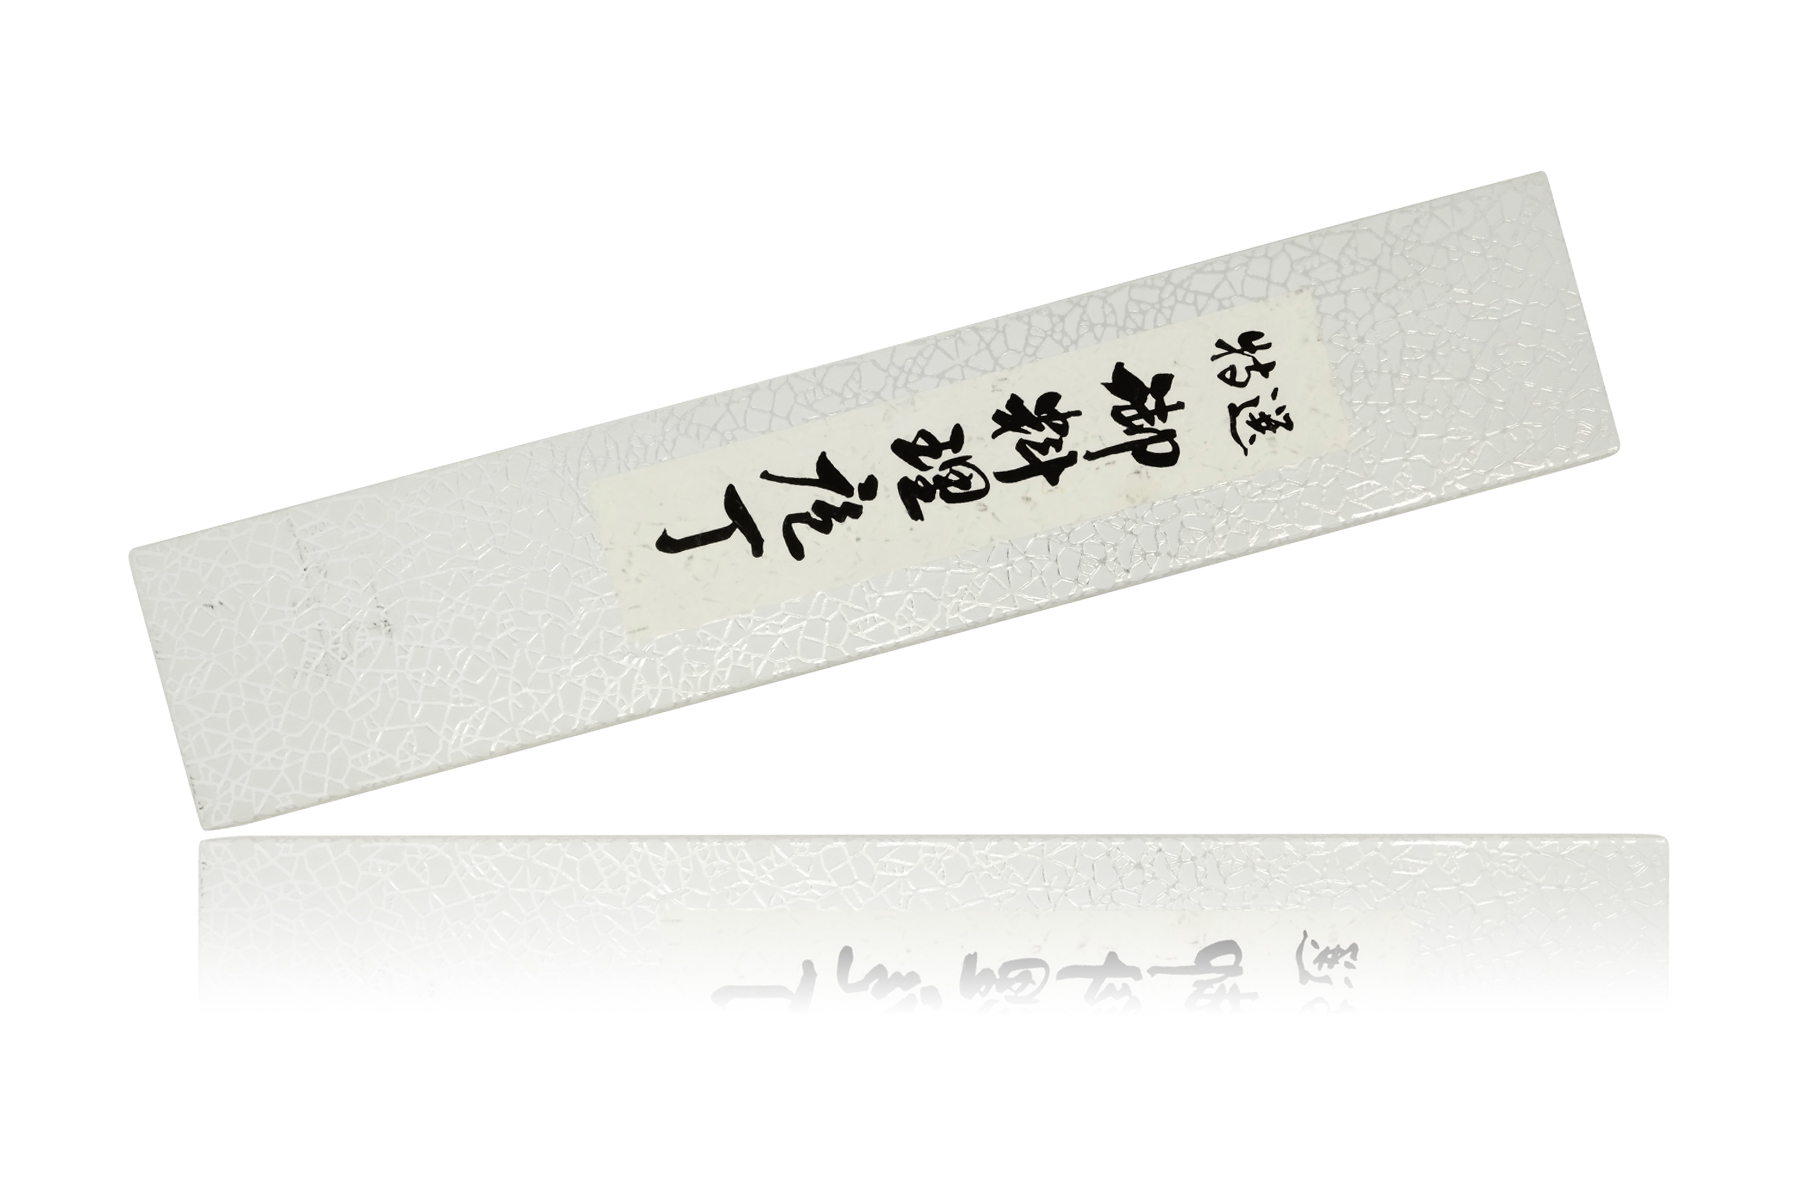 Нож кухонный стальной Шеф 180мм Hiroo Itou Damaskus HI-1168